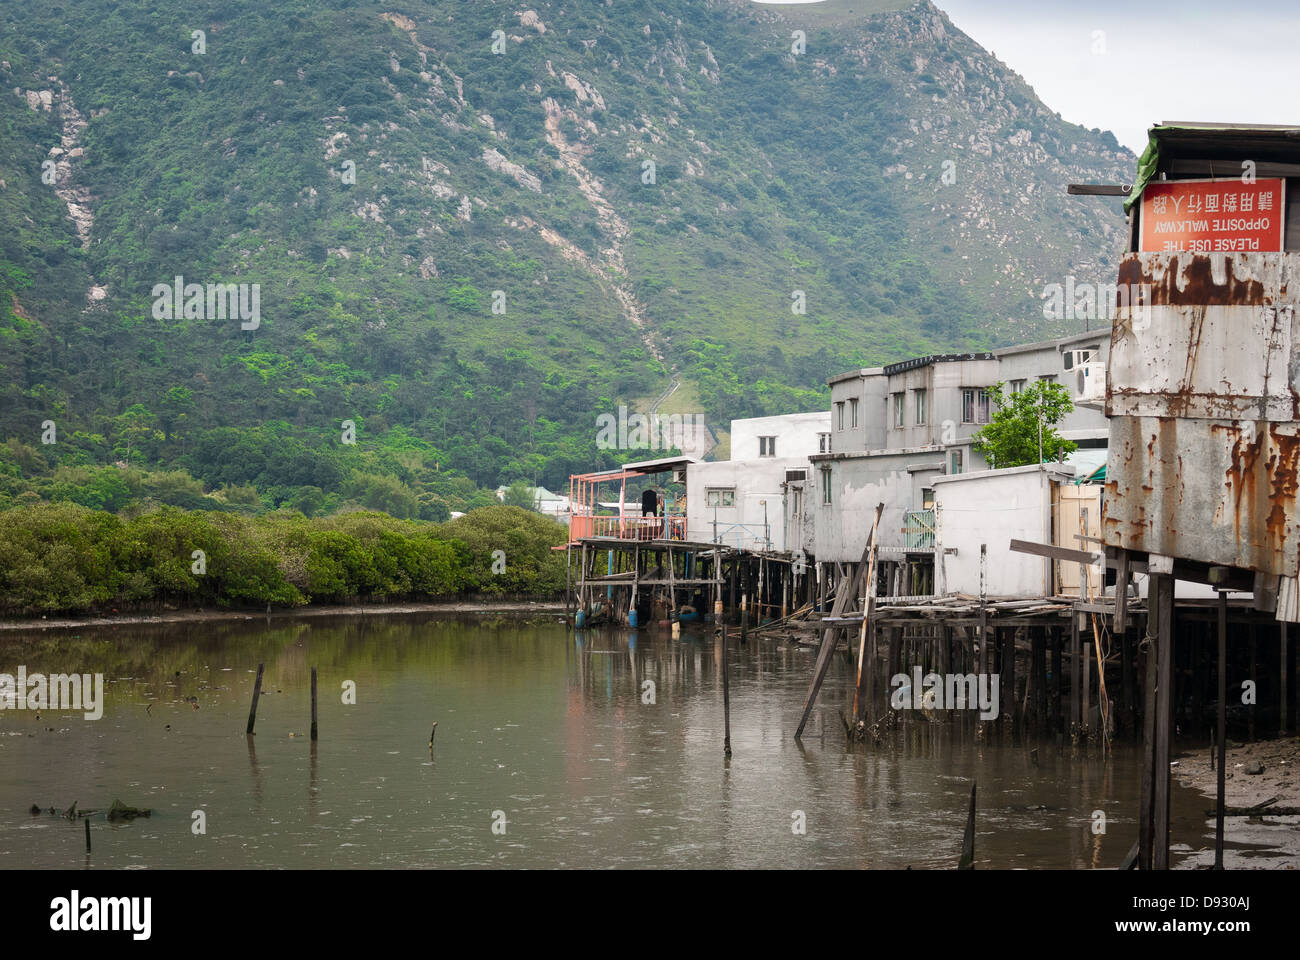 Tai O fishing village - Stock Image